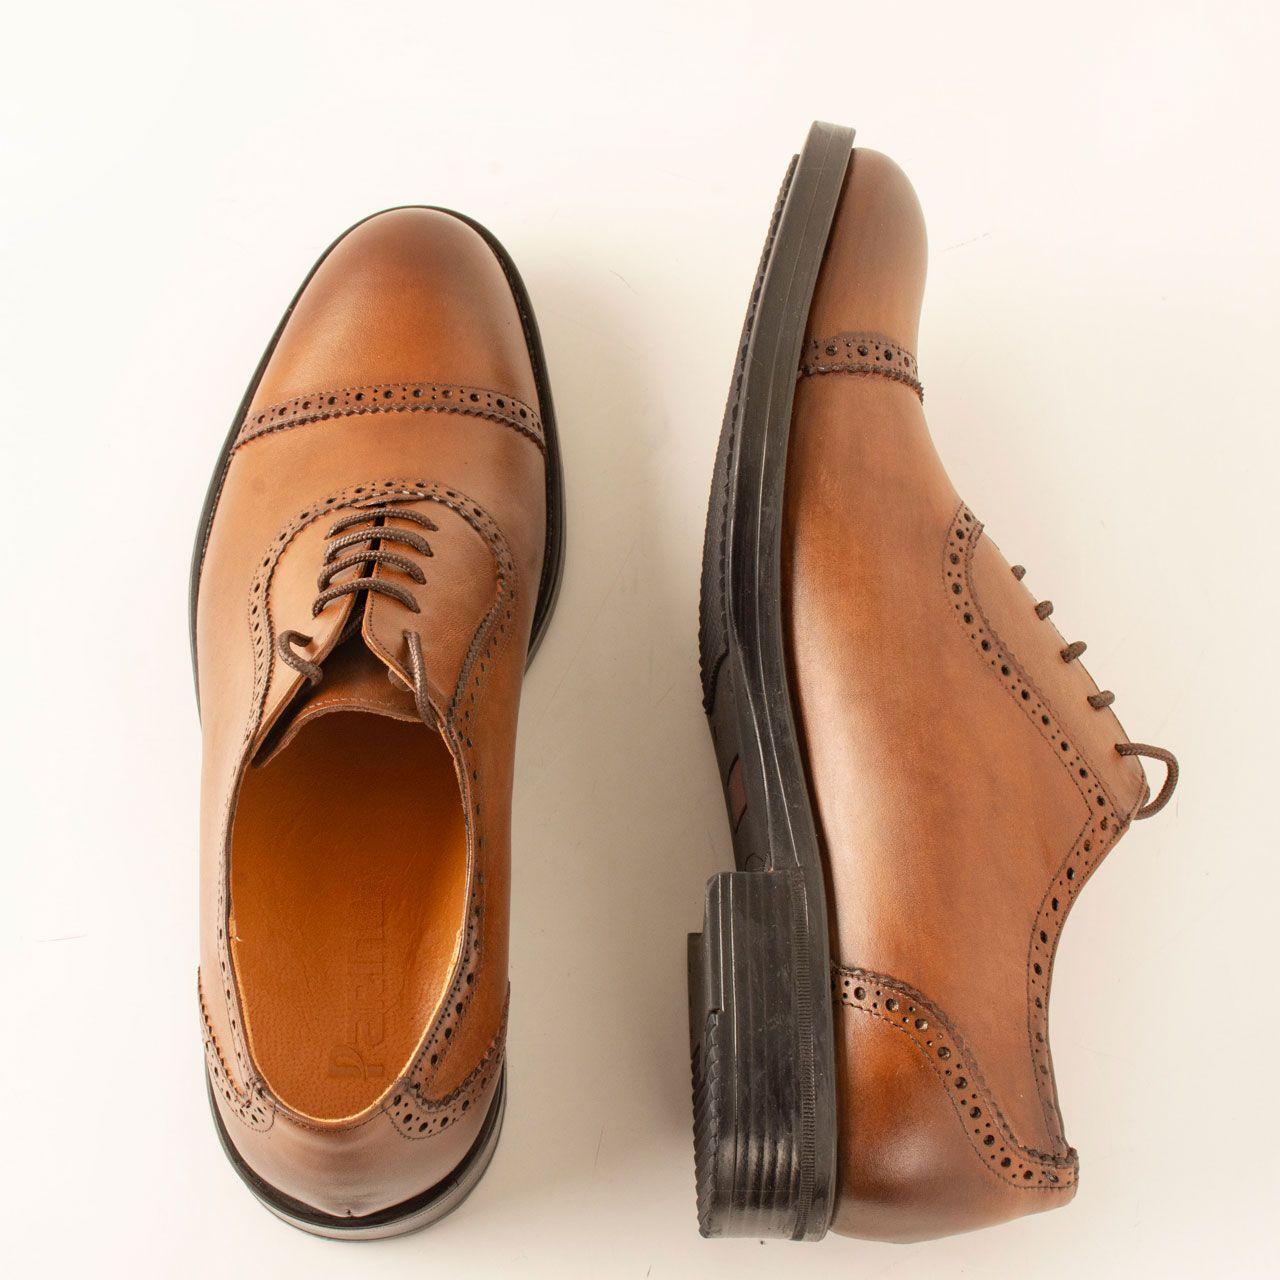 کفش مردانه پارینه چرم مدل SHO182-1 -  - 5